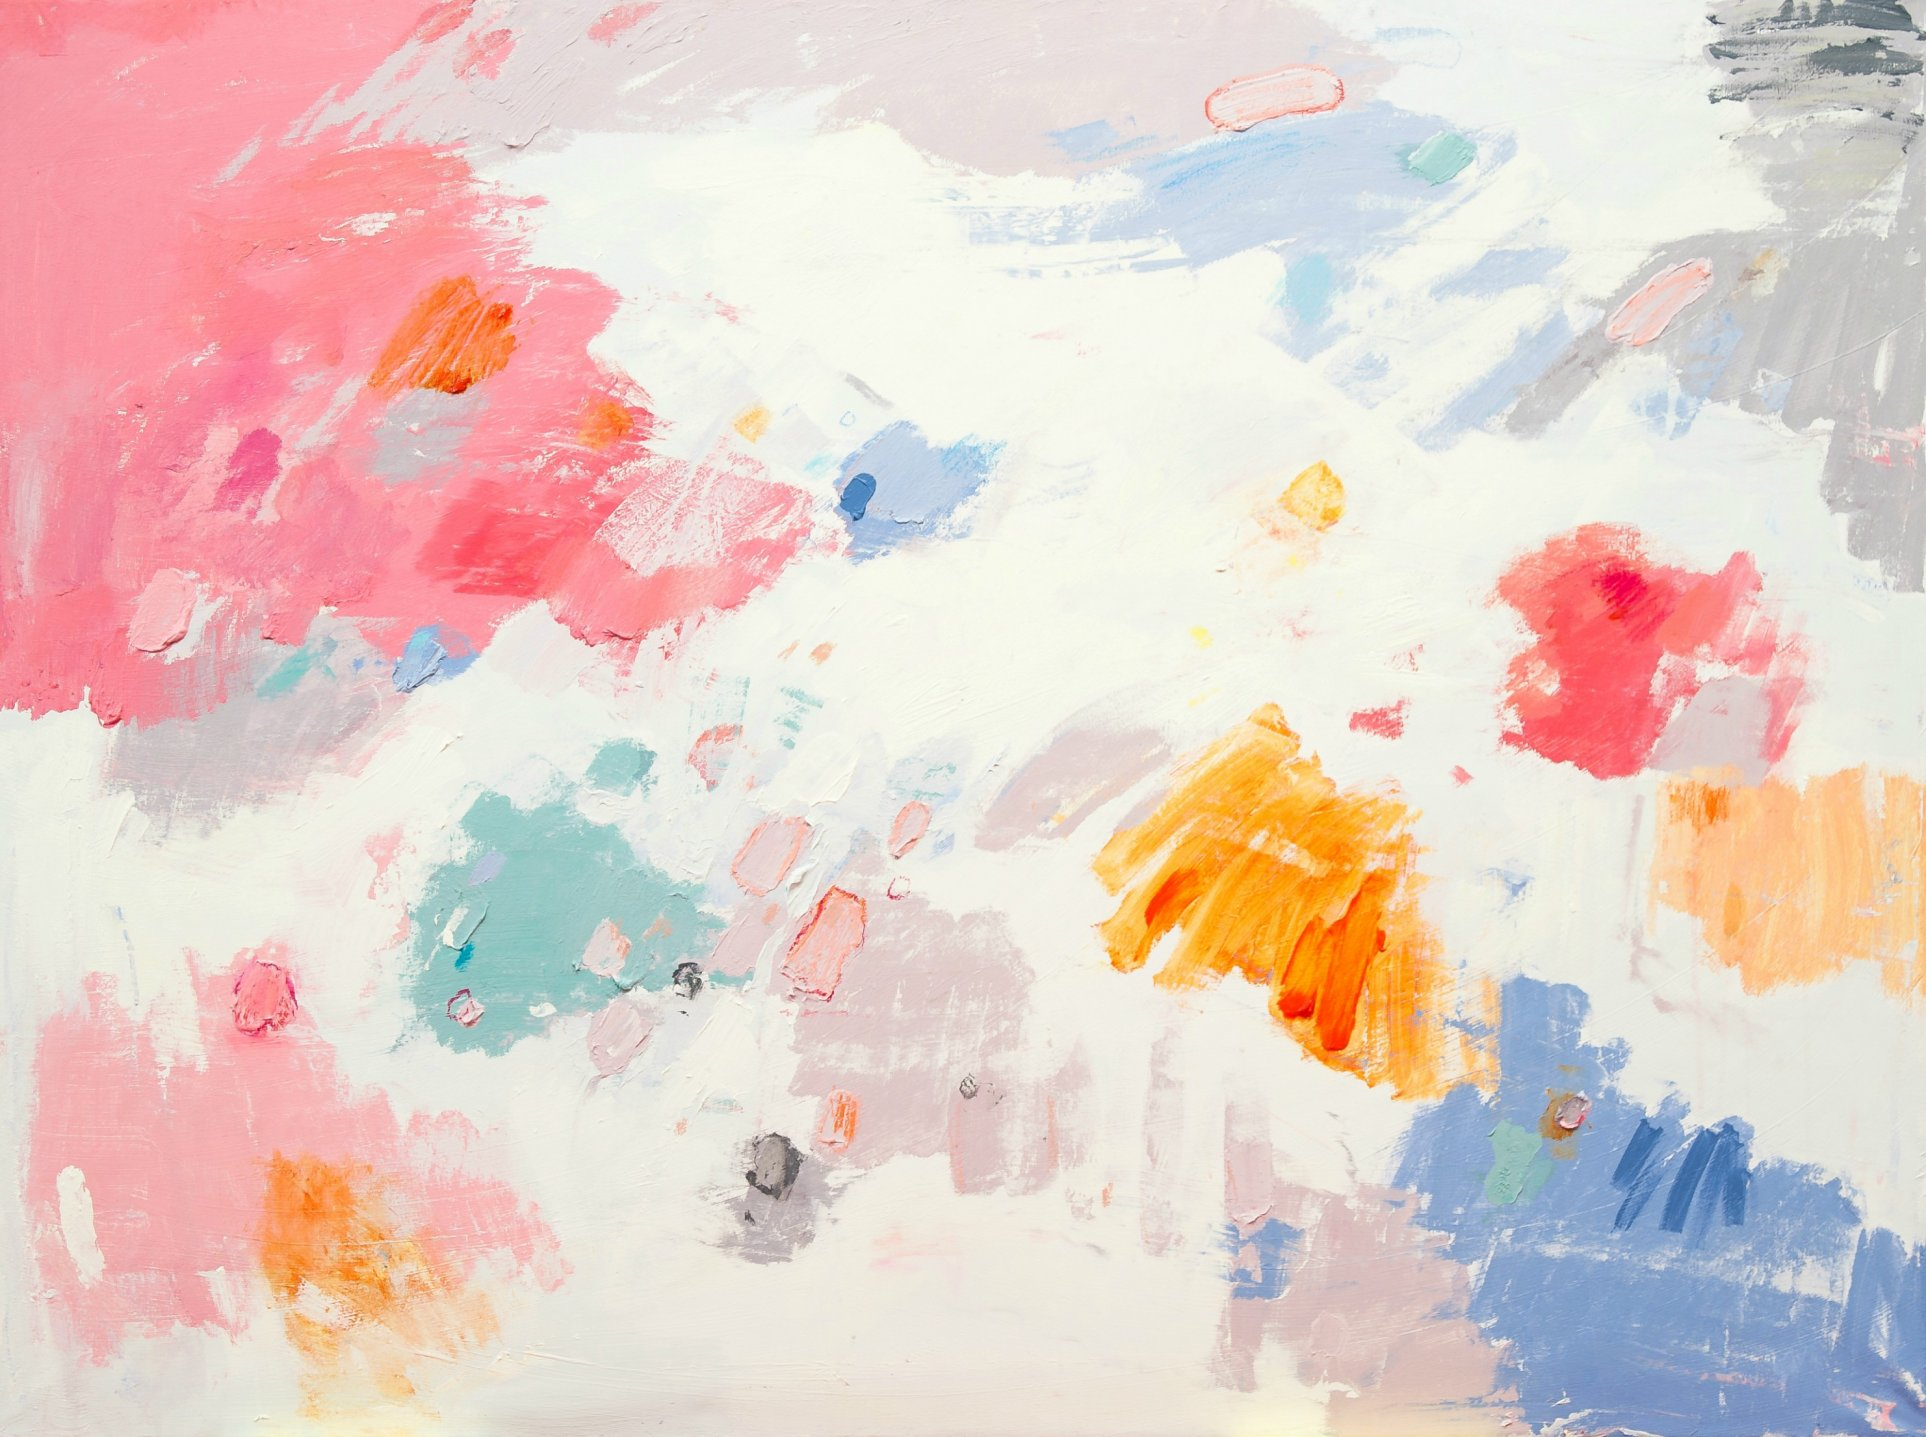 Abstraction (2019) - Susana Sancho Beltrán